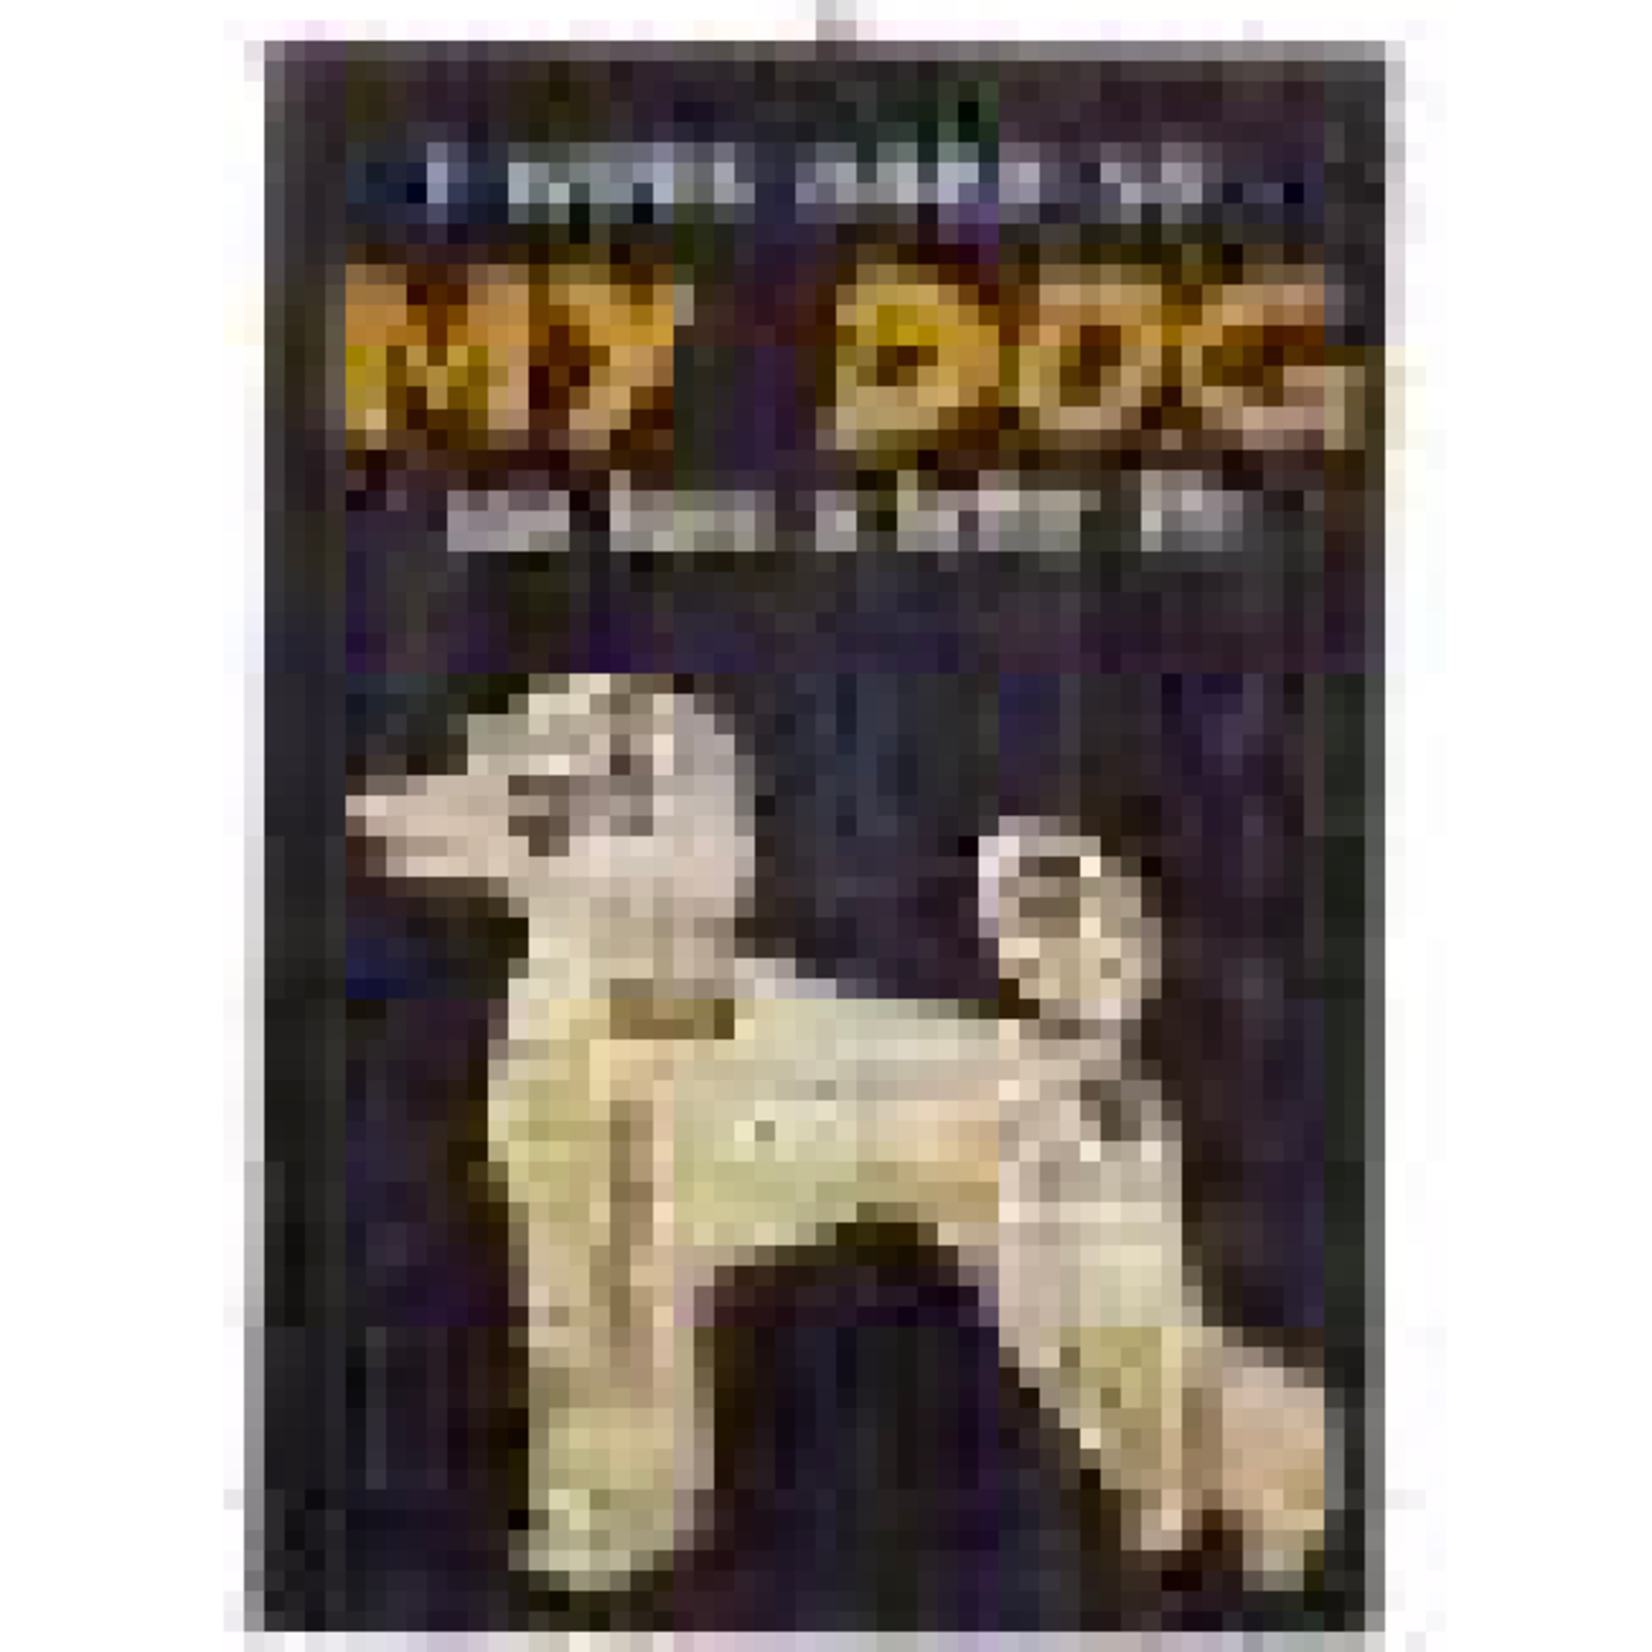 Ornament - Dog (I Work Hard So My Dog)